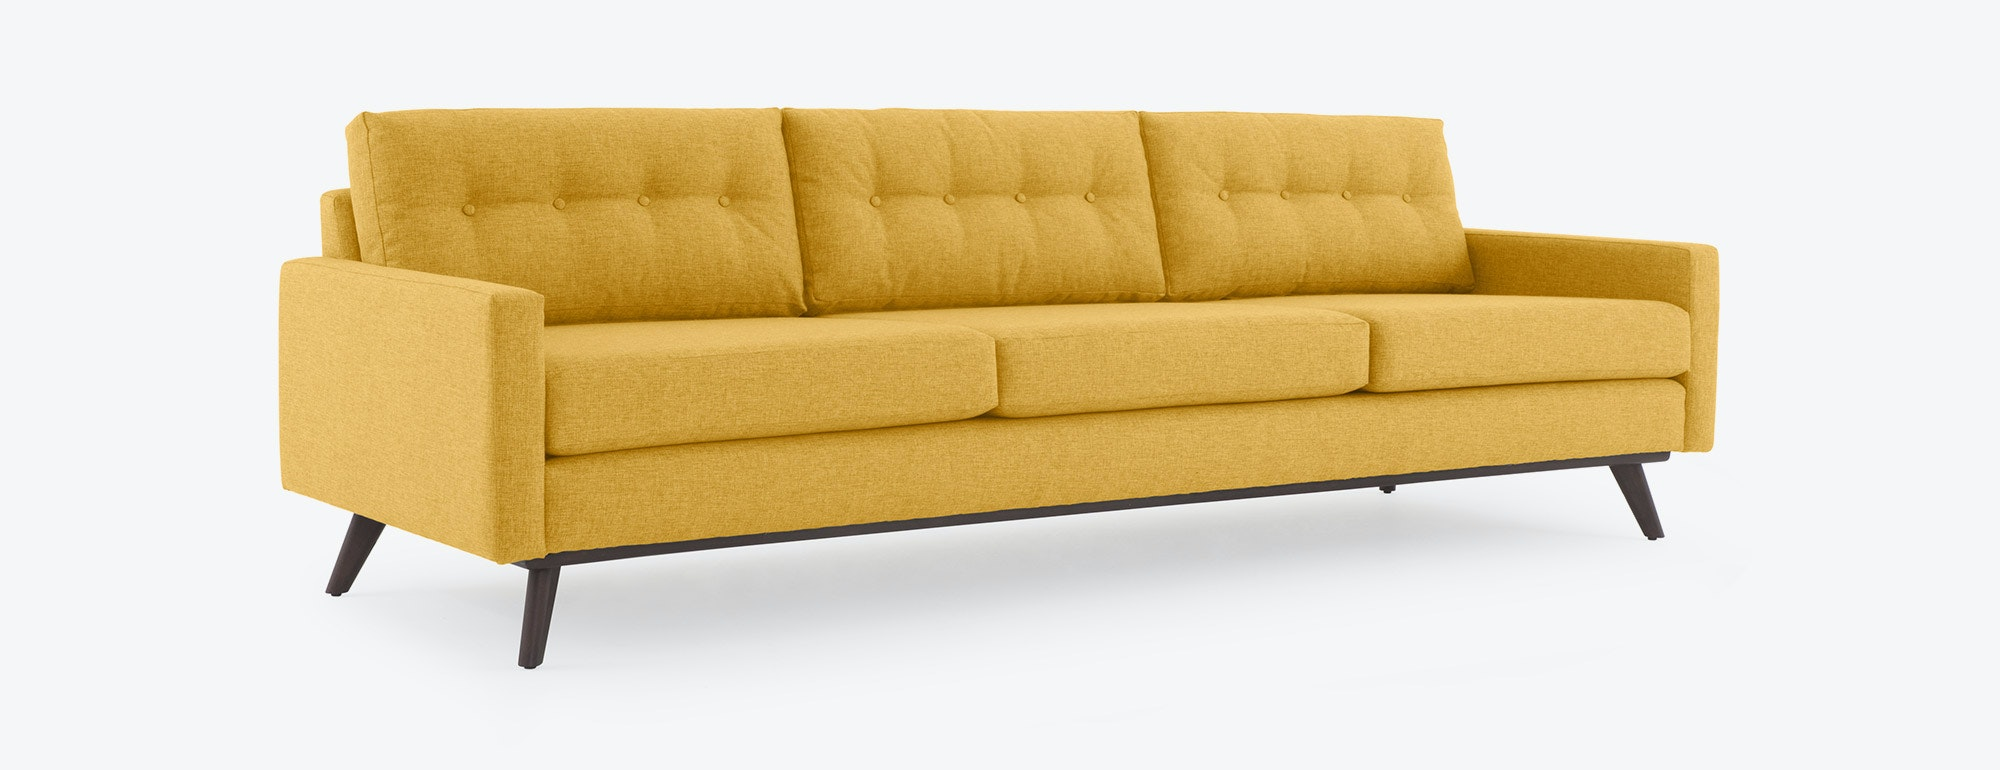 grand sofa fold out bed hopson joybird